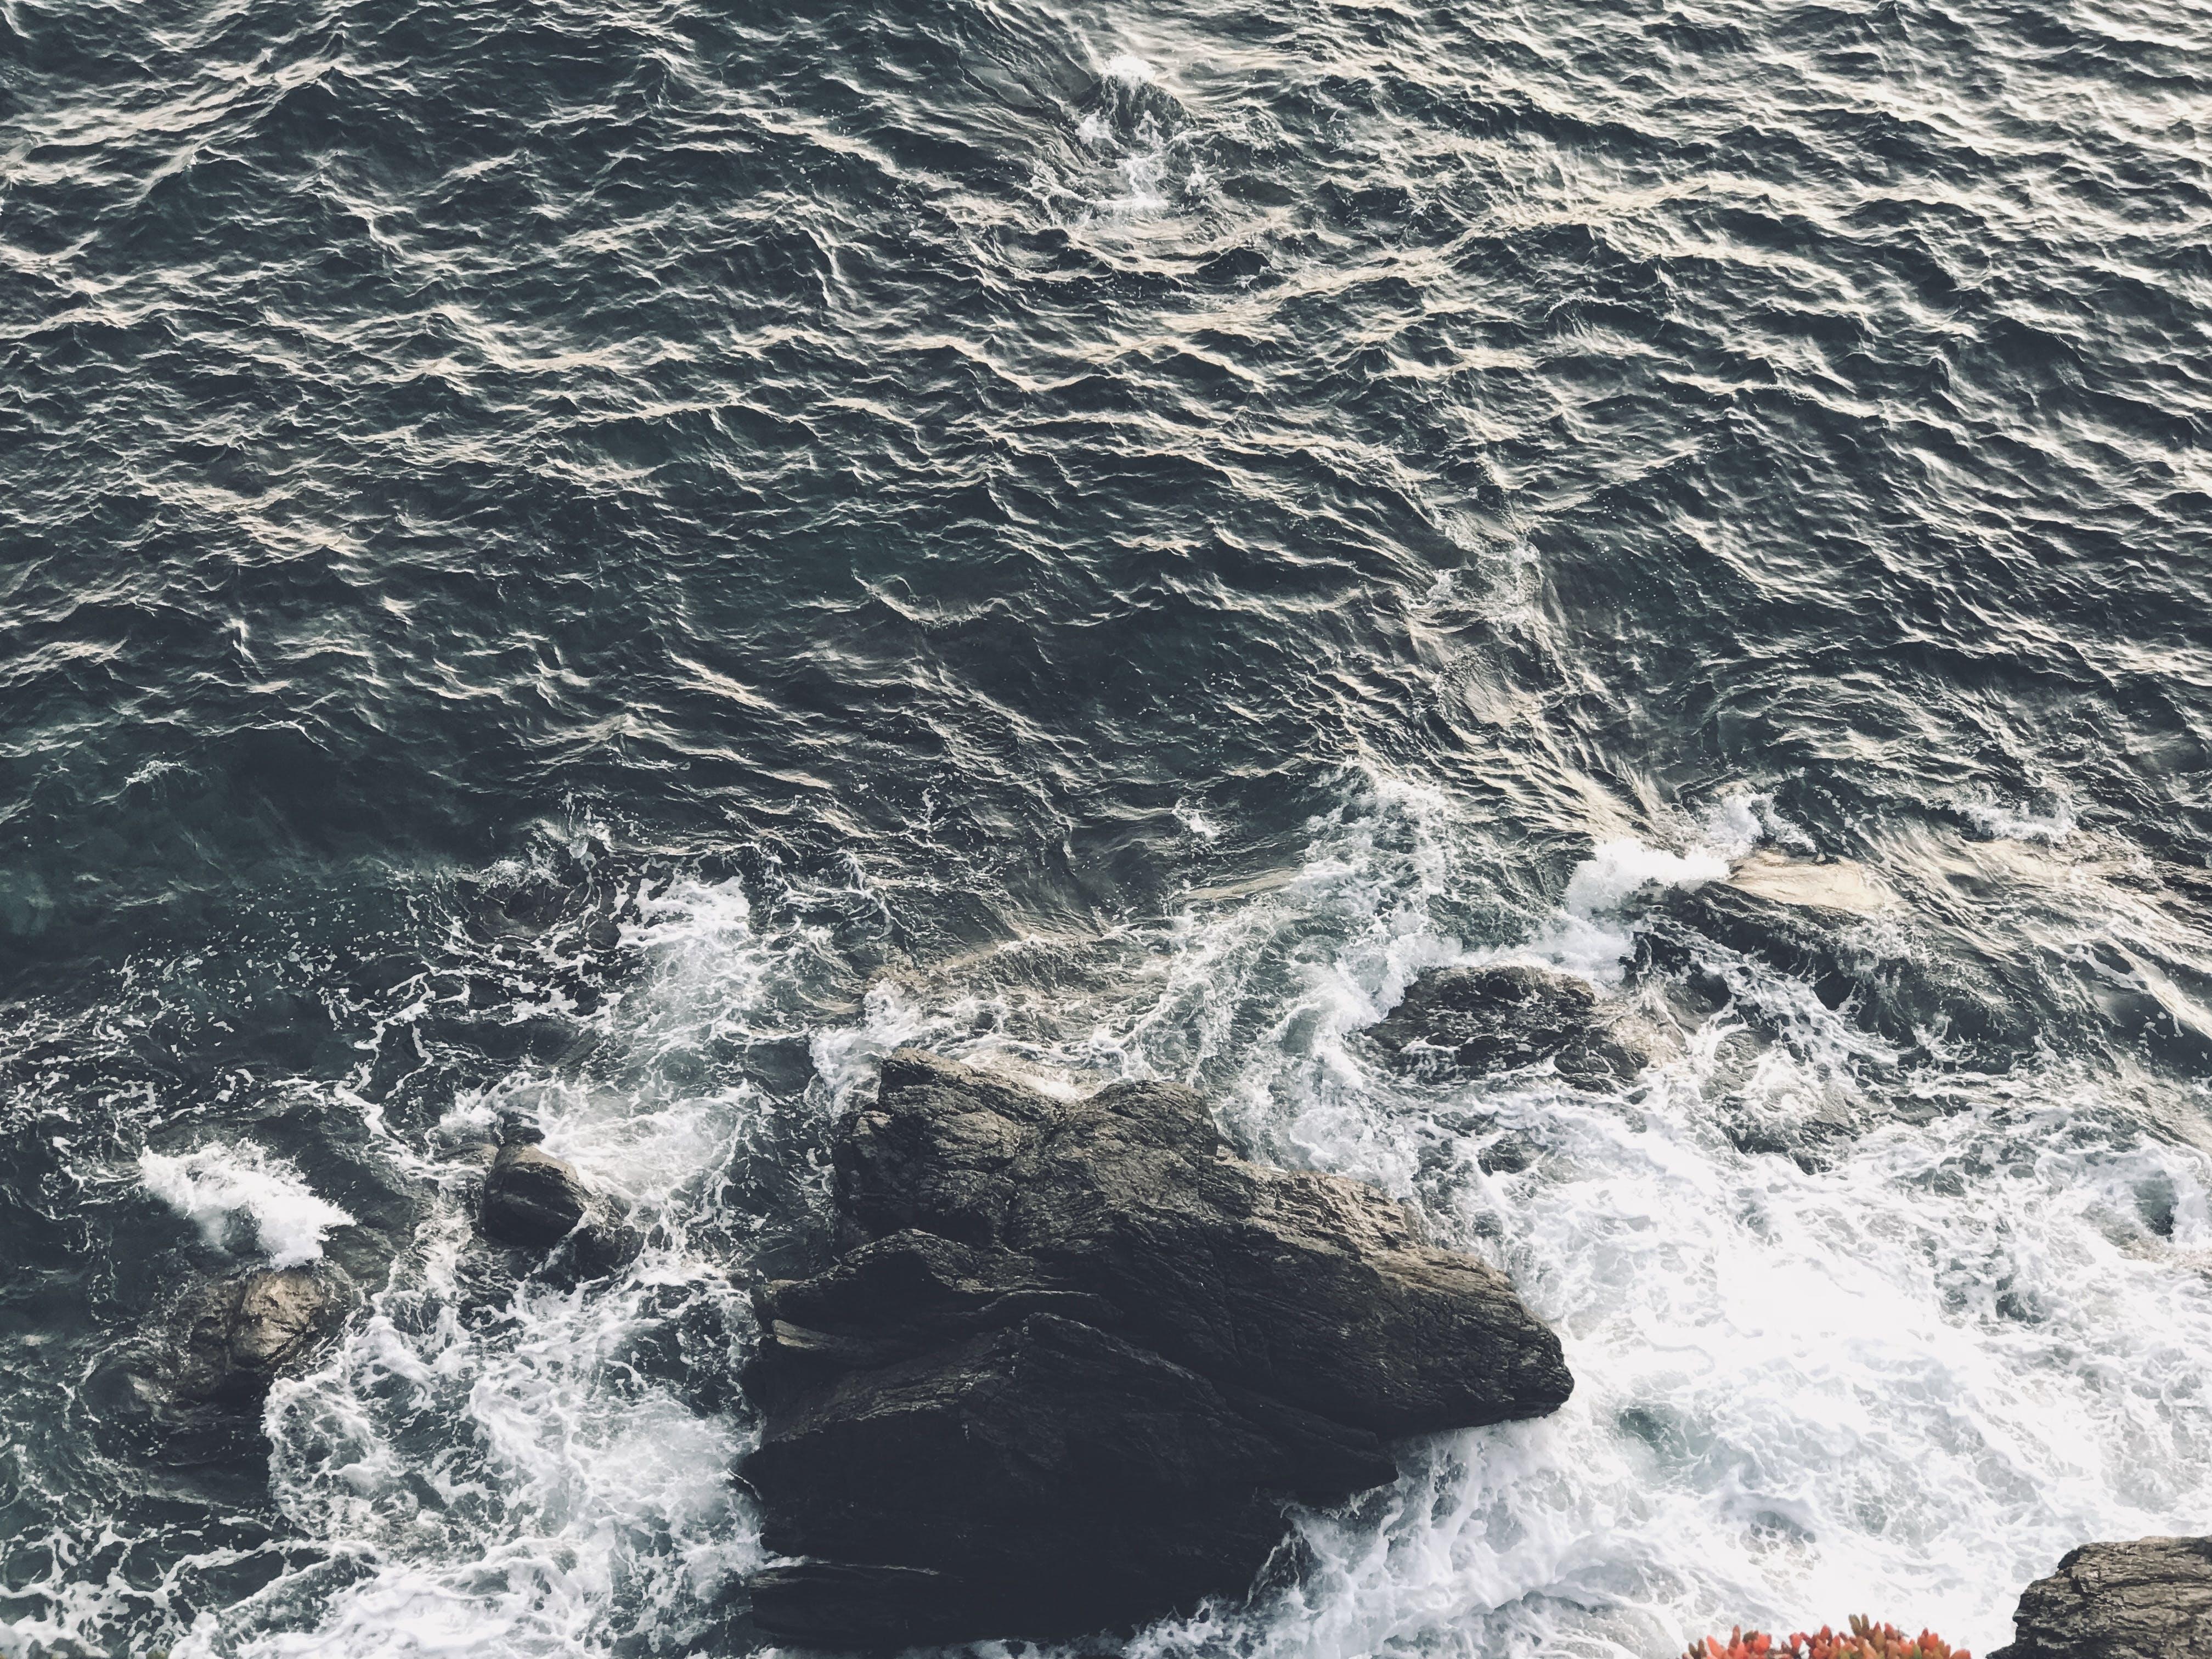 Free stock photo of ocean, rocks, waves